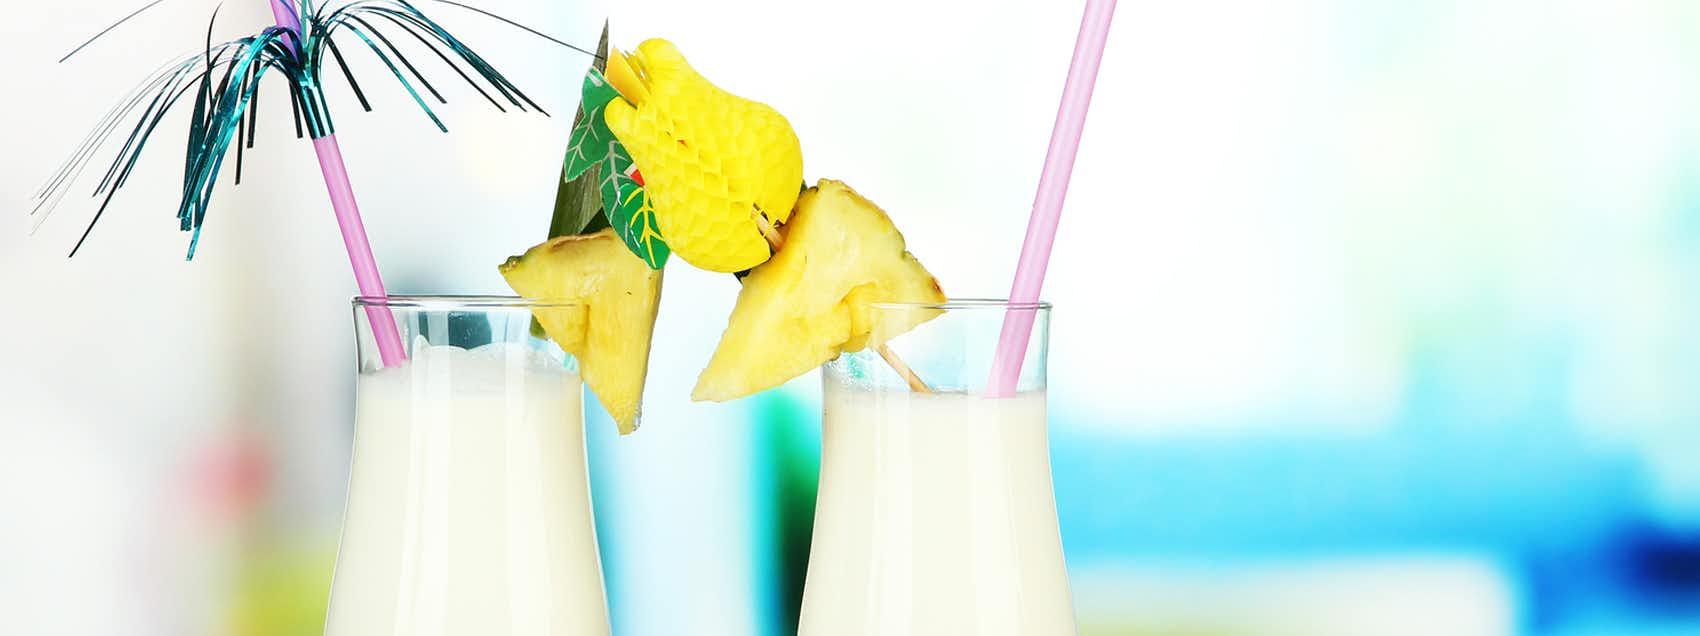 Malibu Recipes